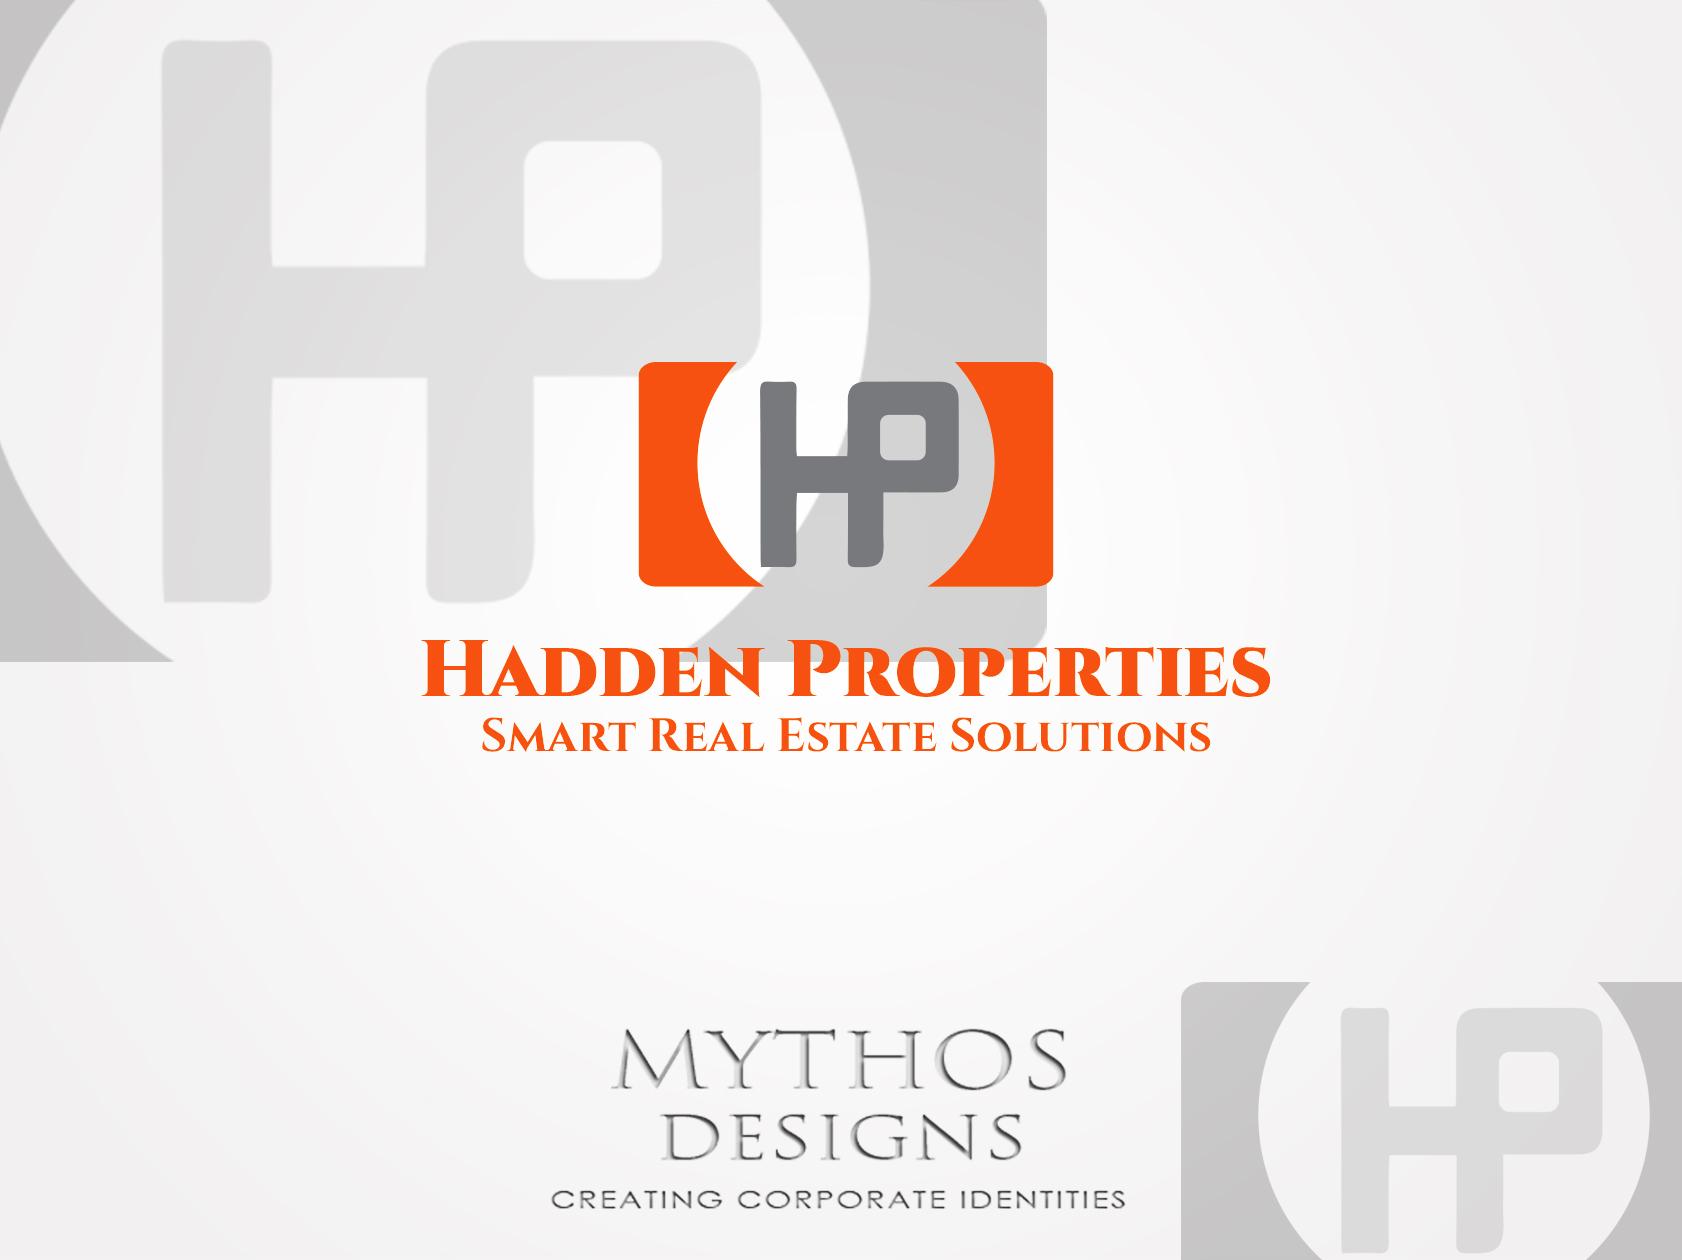 Logo Design by Mythos Designs - Entry No. 73 in the Logo Design Contest Artistic Logo Design for Hadden Properties.